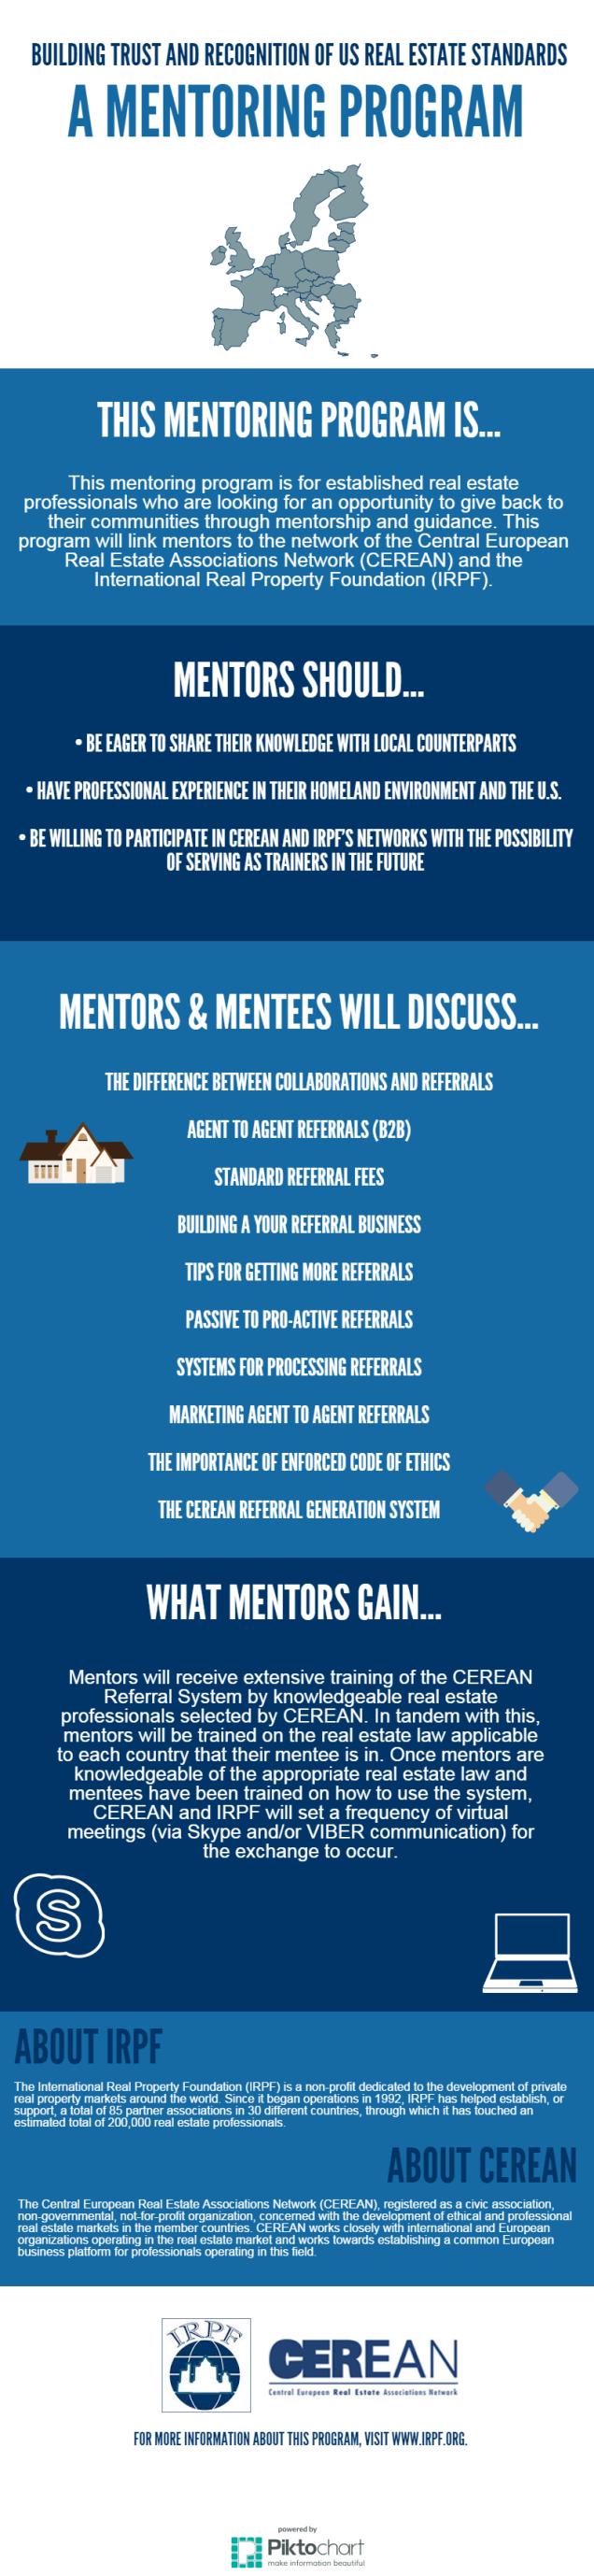 mentoring-program-irpf-cerean-2015